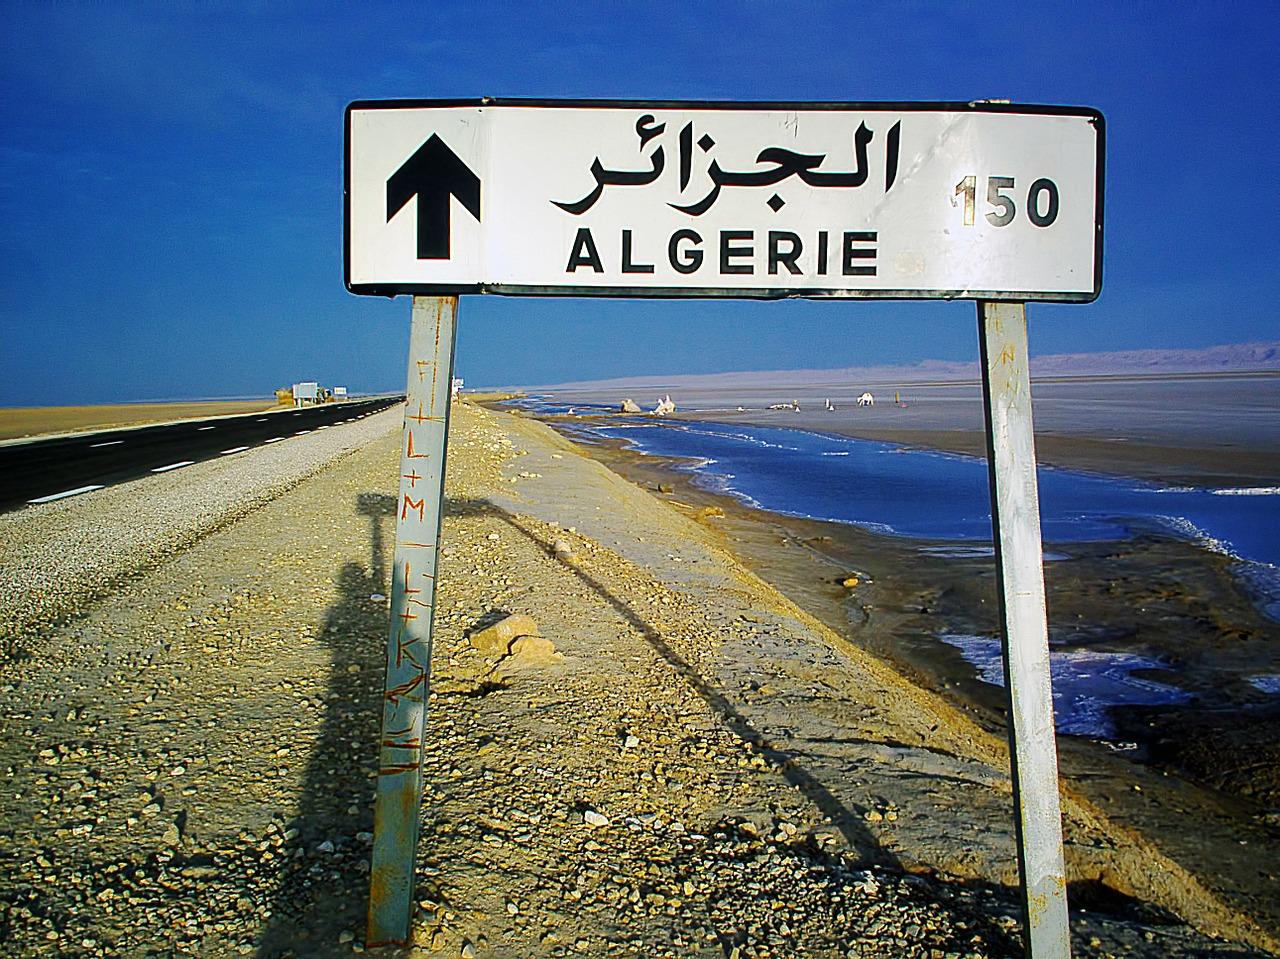 Algeria votes to approve constitutional reforms